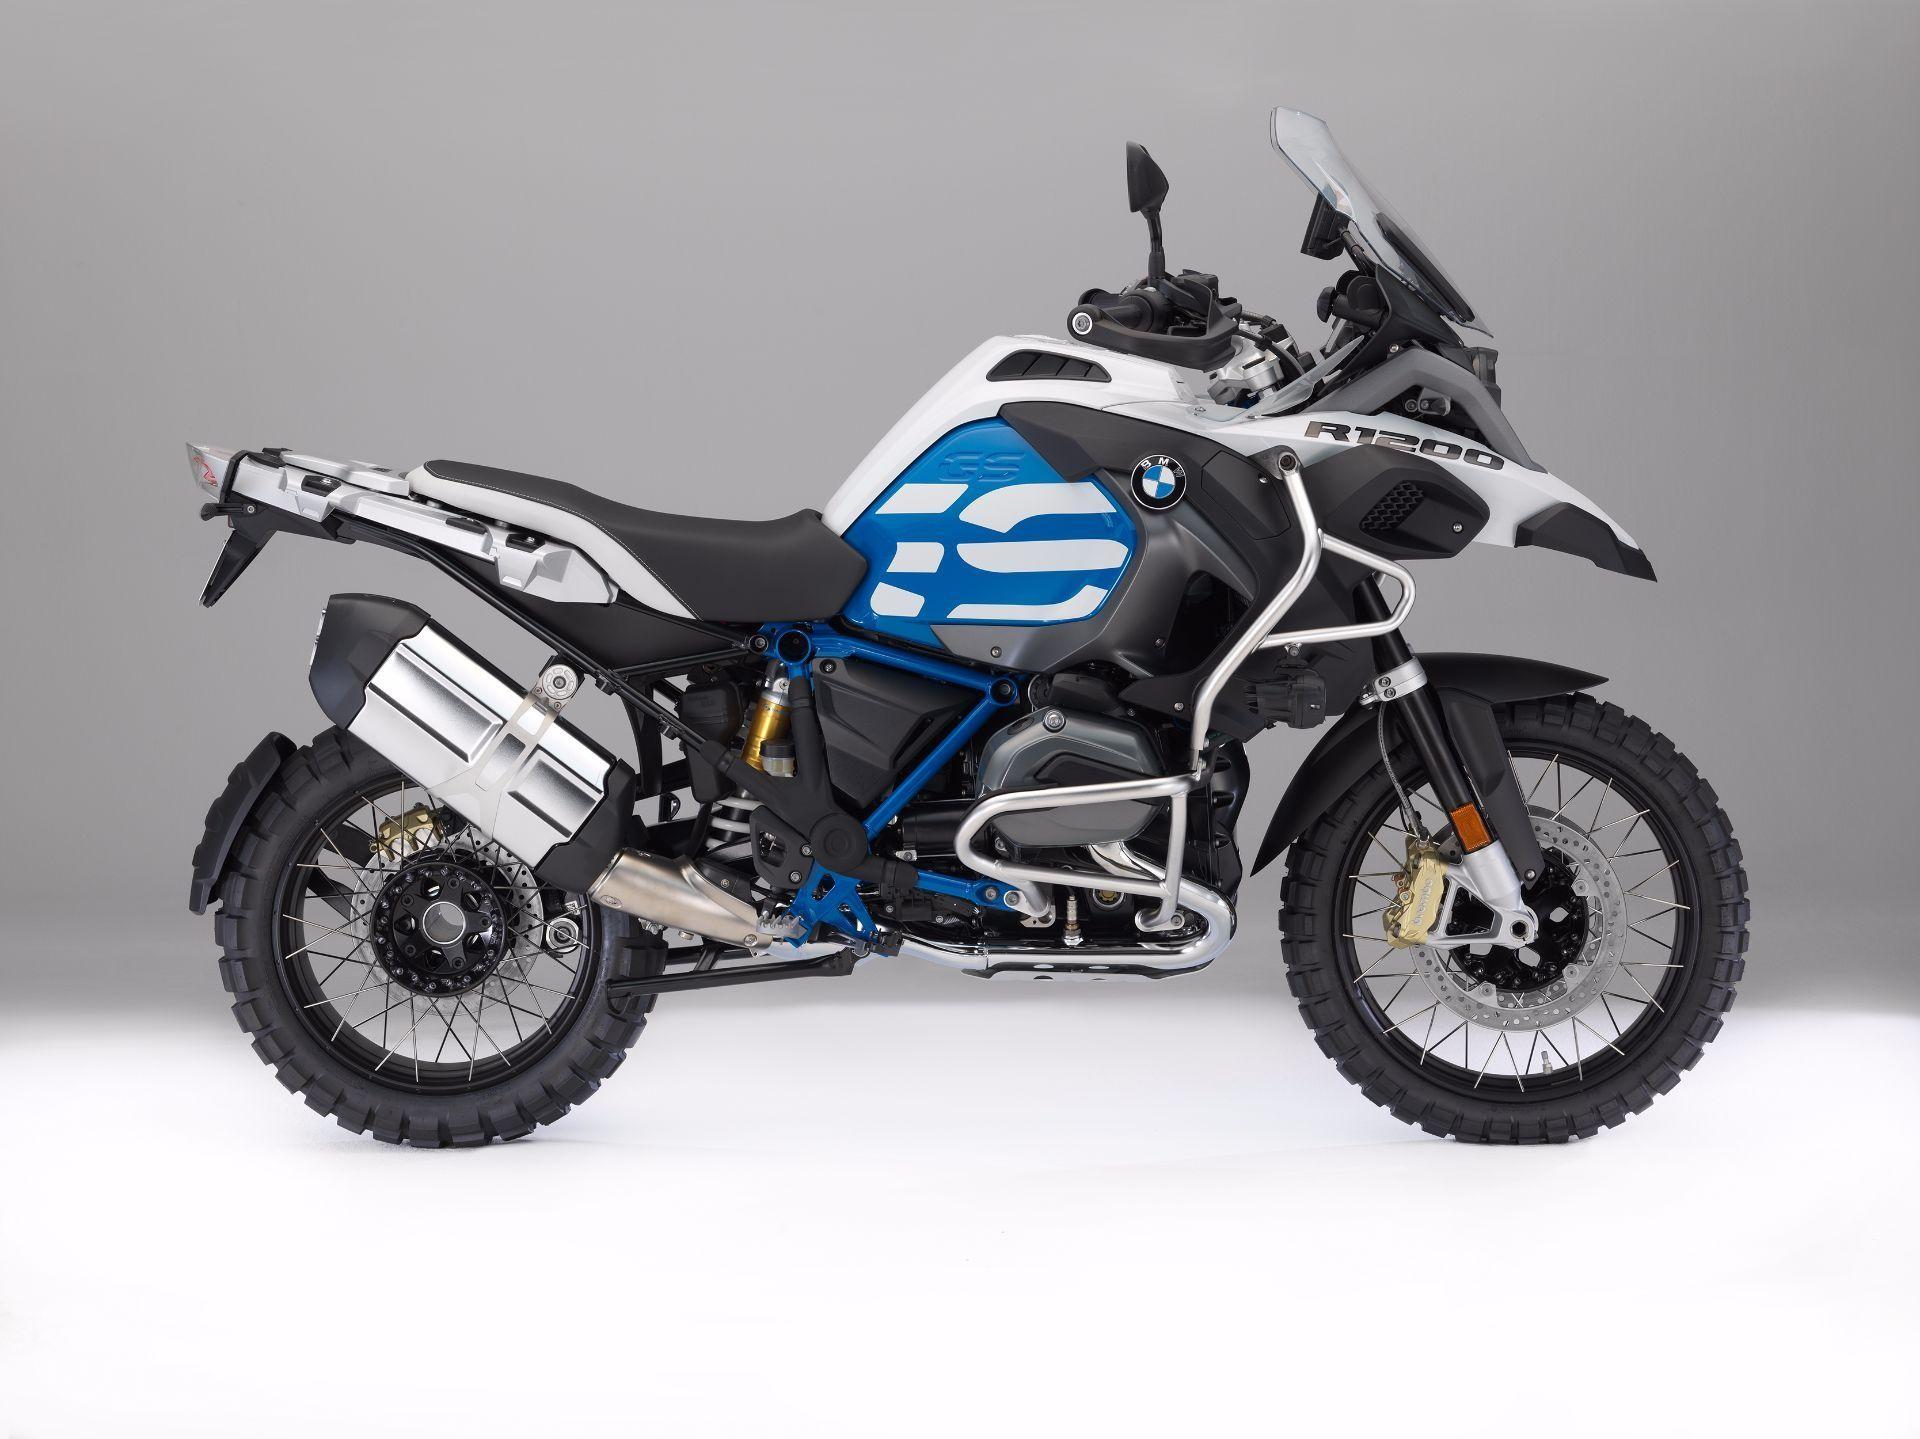 Motorrad Mieten Bmw R 1200 Gs Adventure Abs Motocenter Seetal Hochdorf